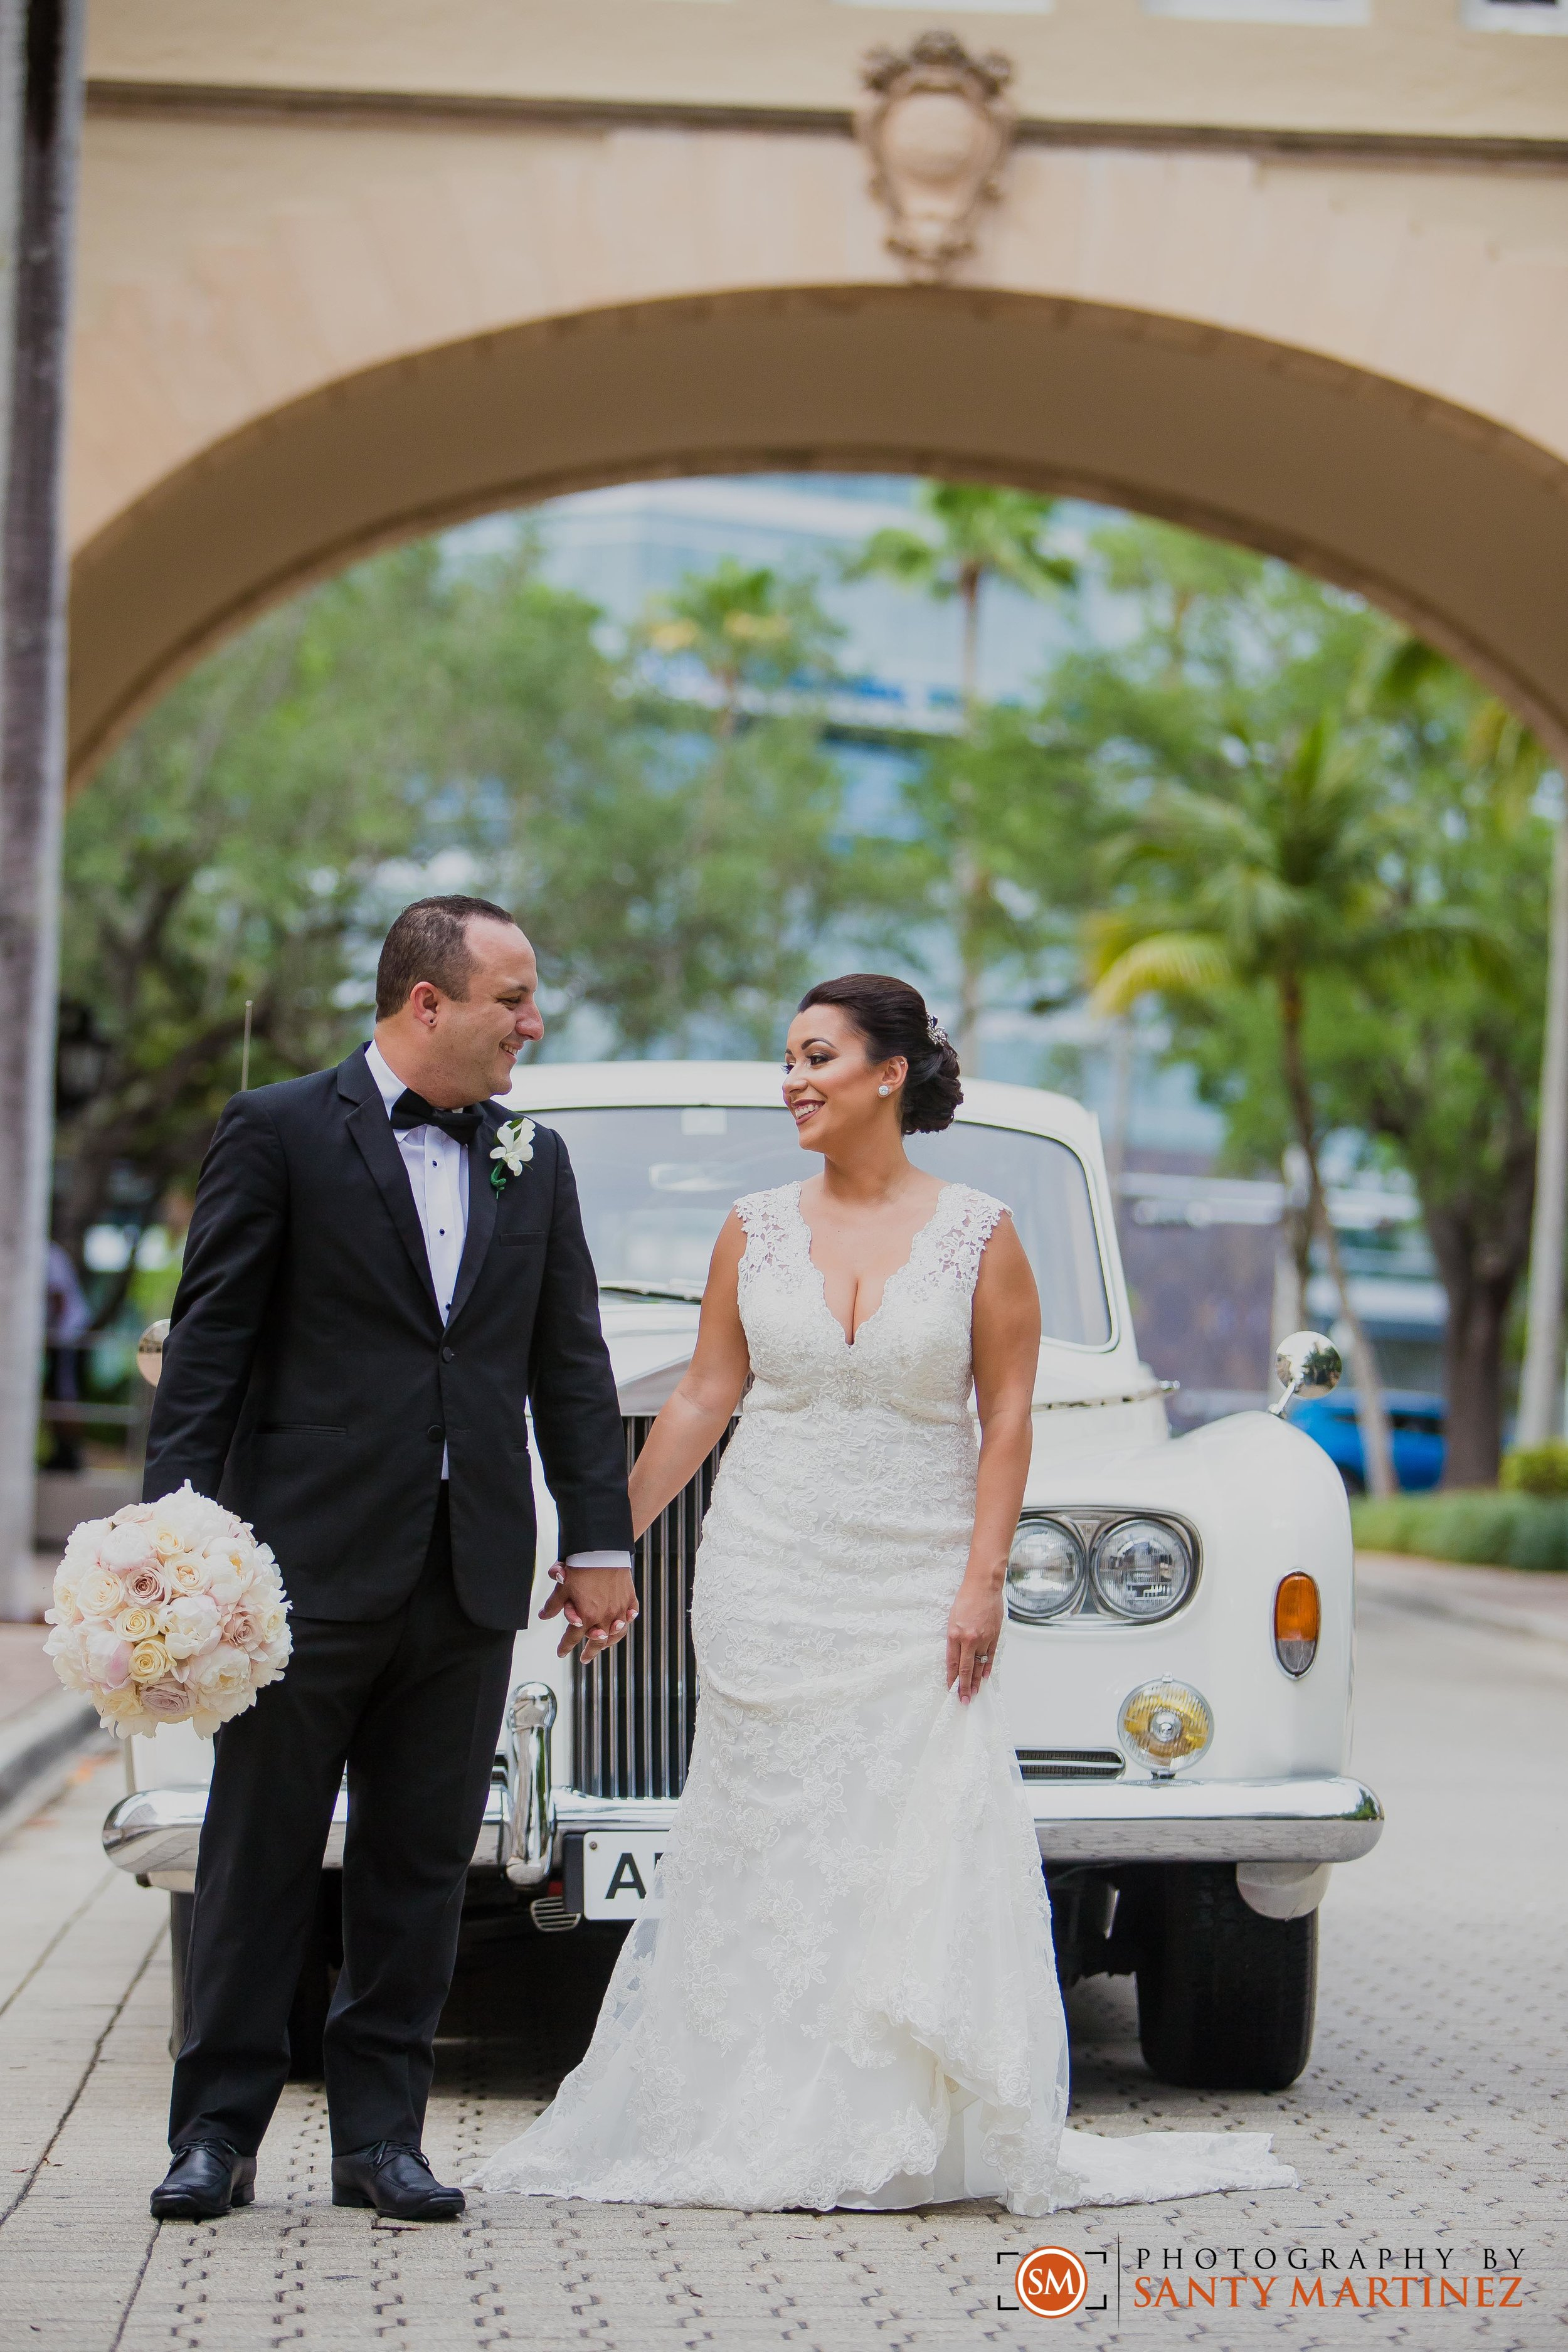 Wedding Douglas Entrance - Photography by Santy Martinez-13.jpg